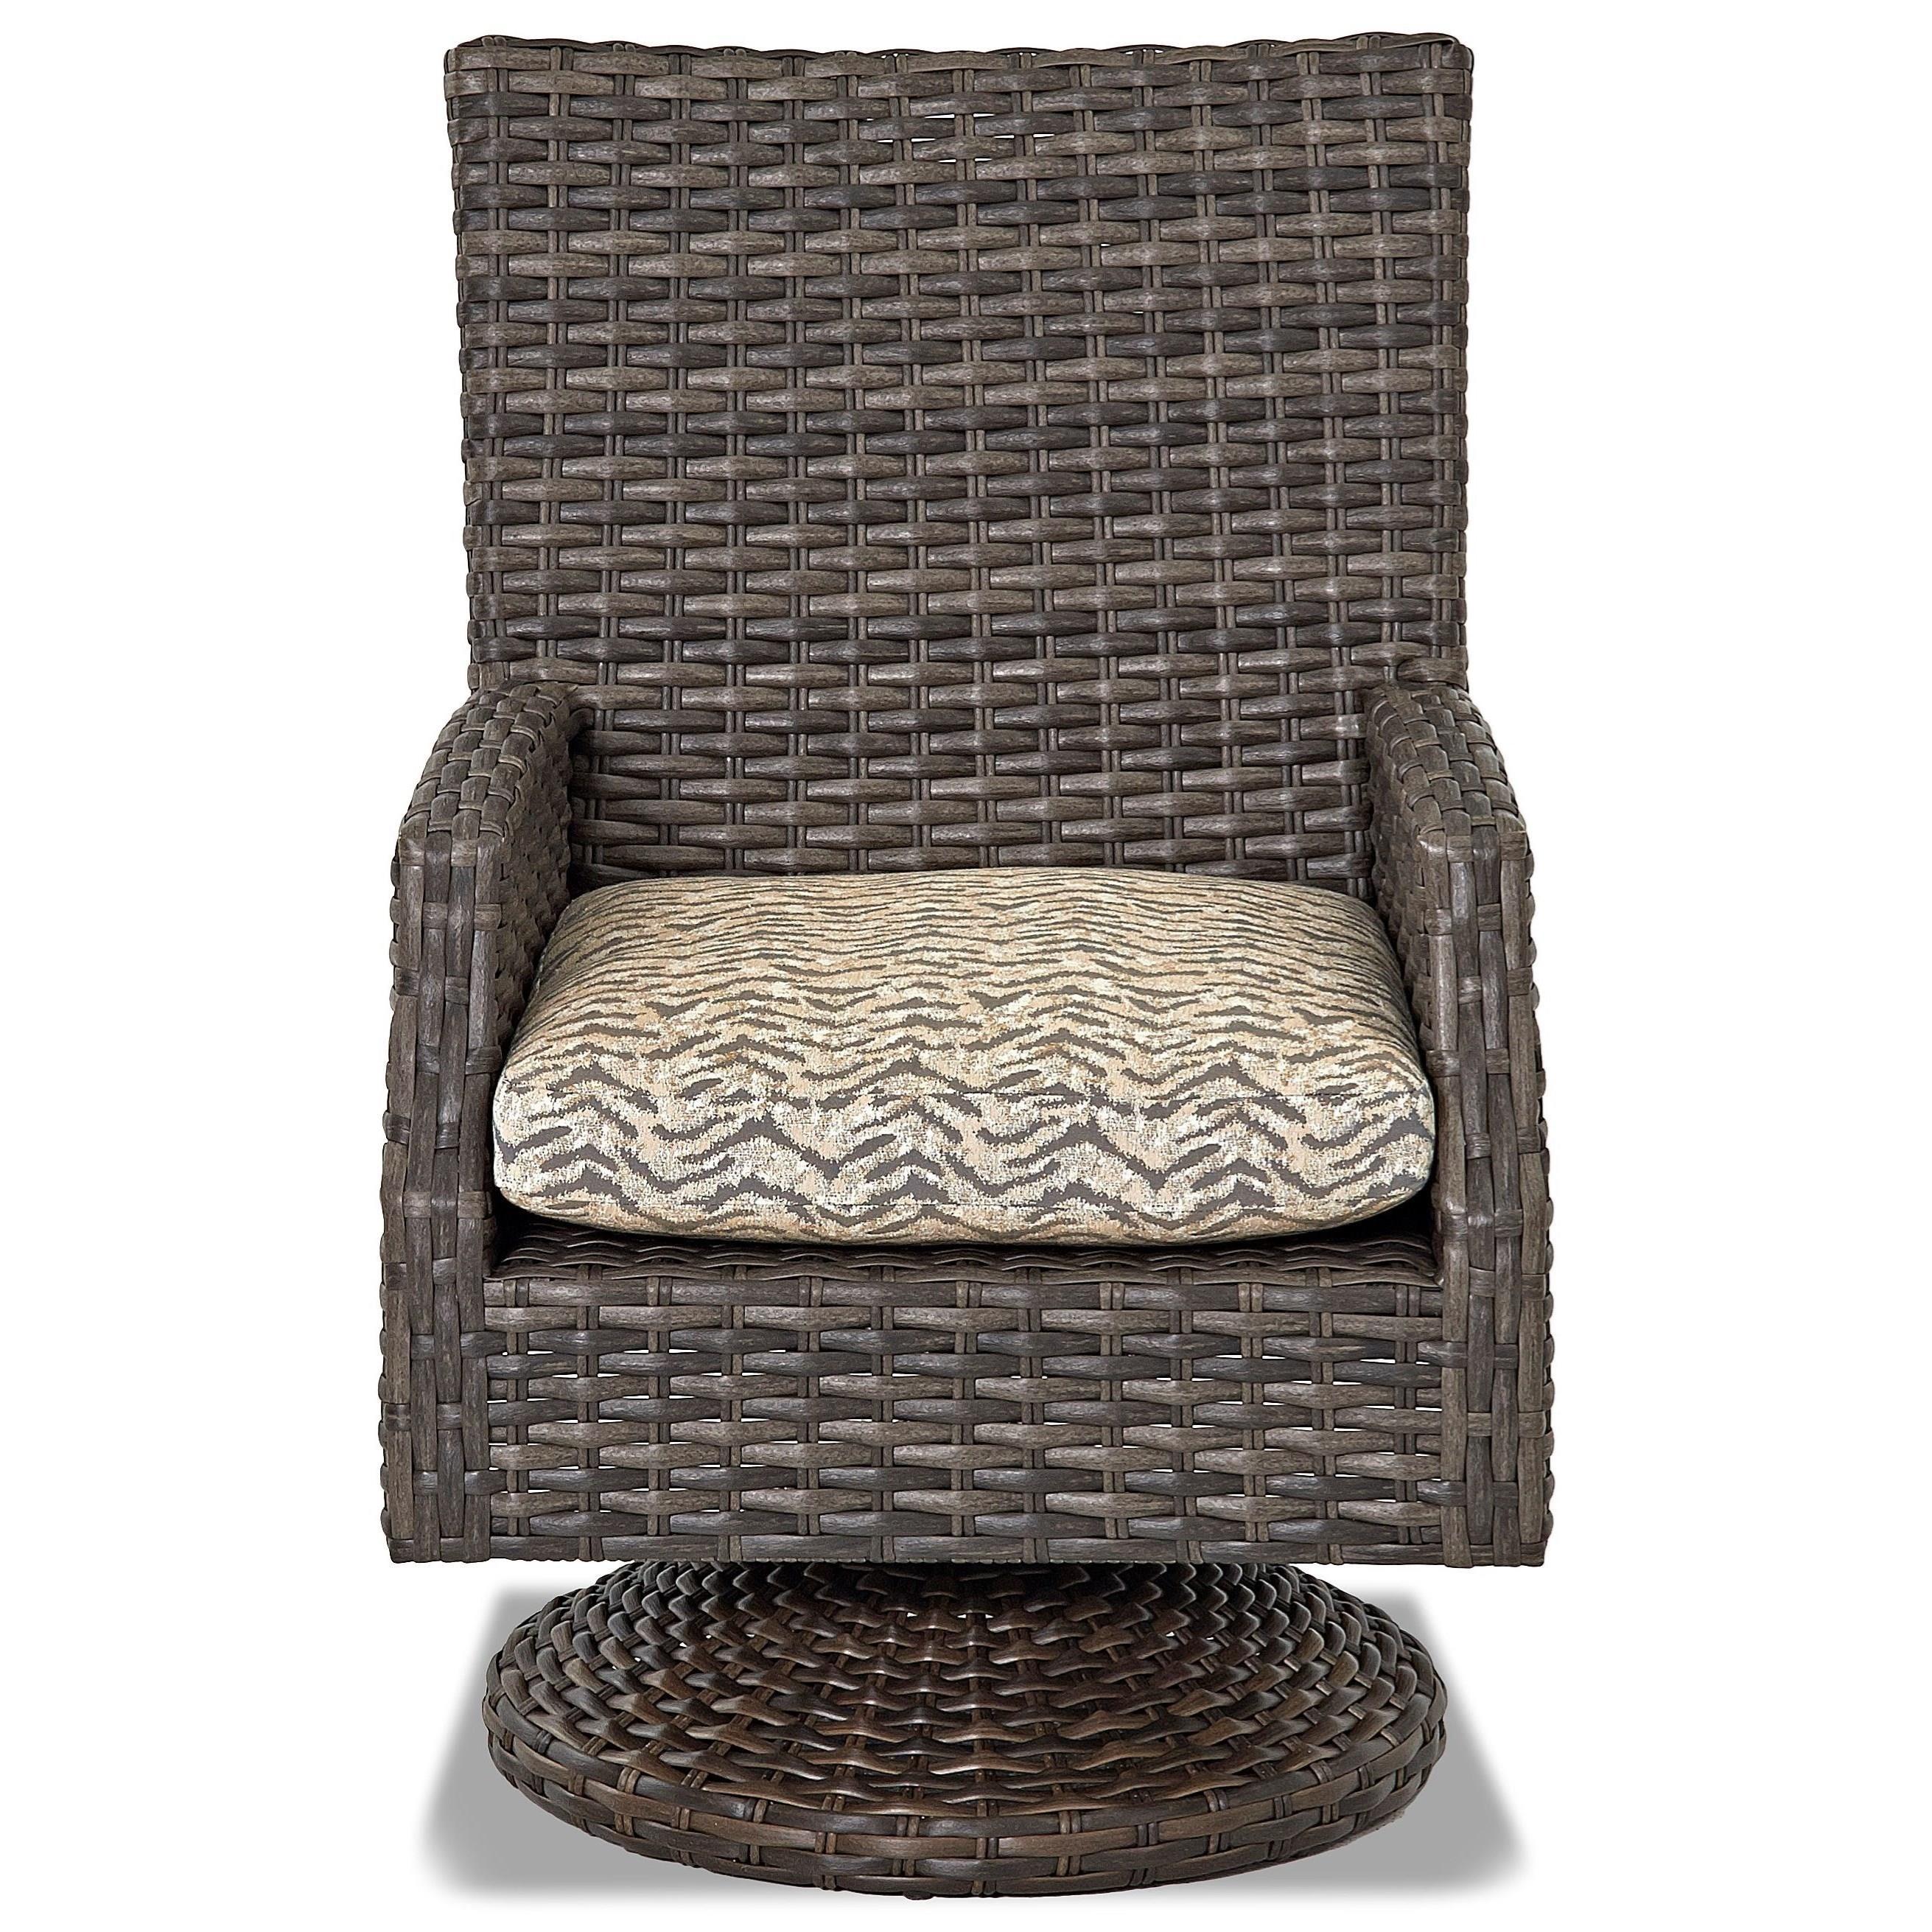 Sw Rock Din Chair w/ Reversible Cushion